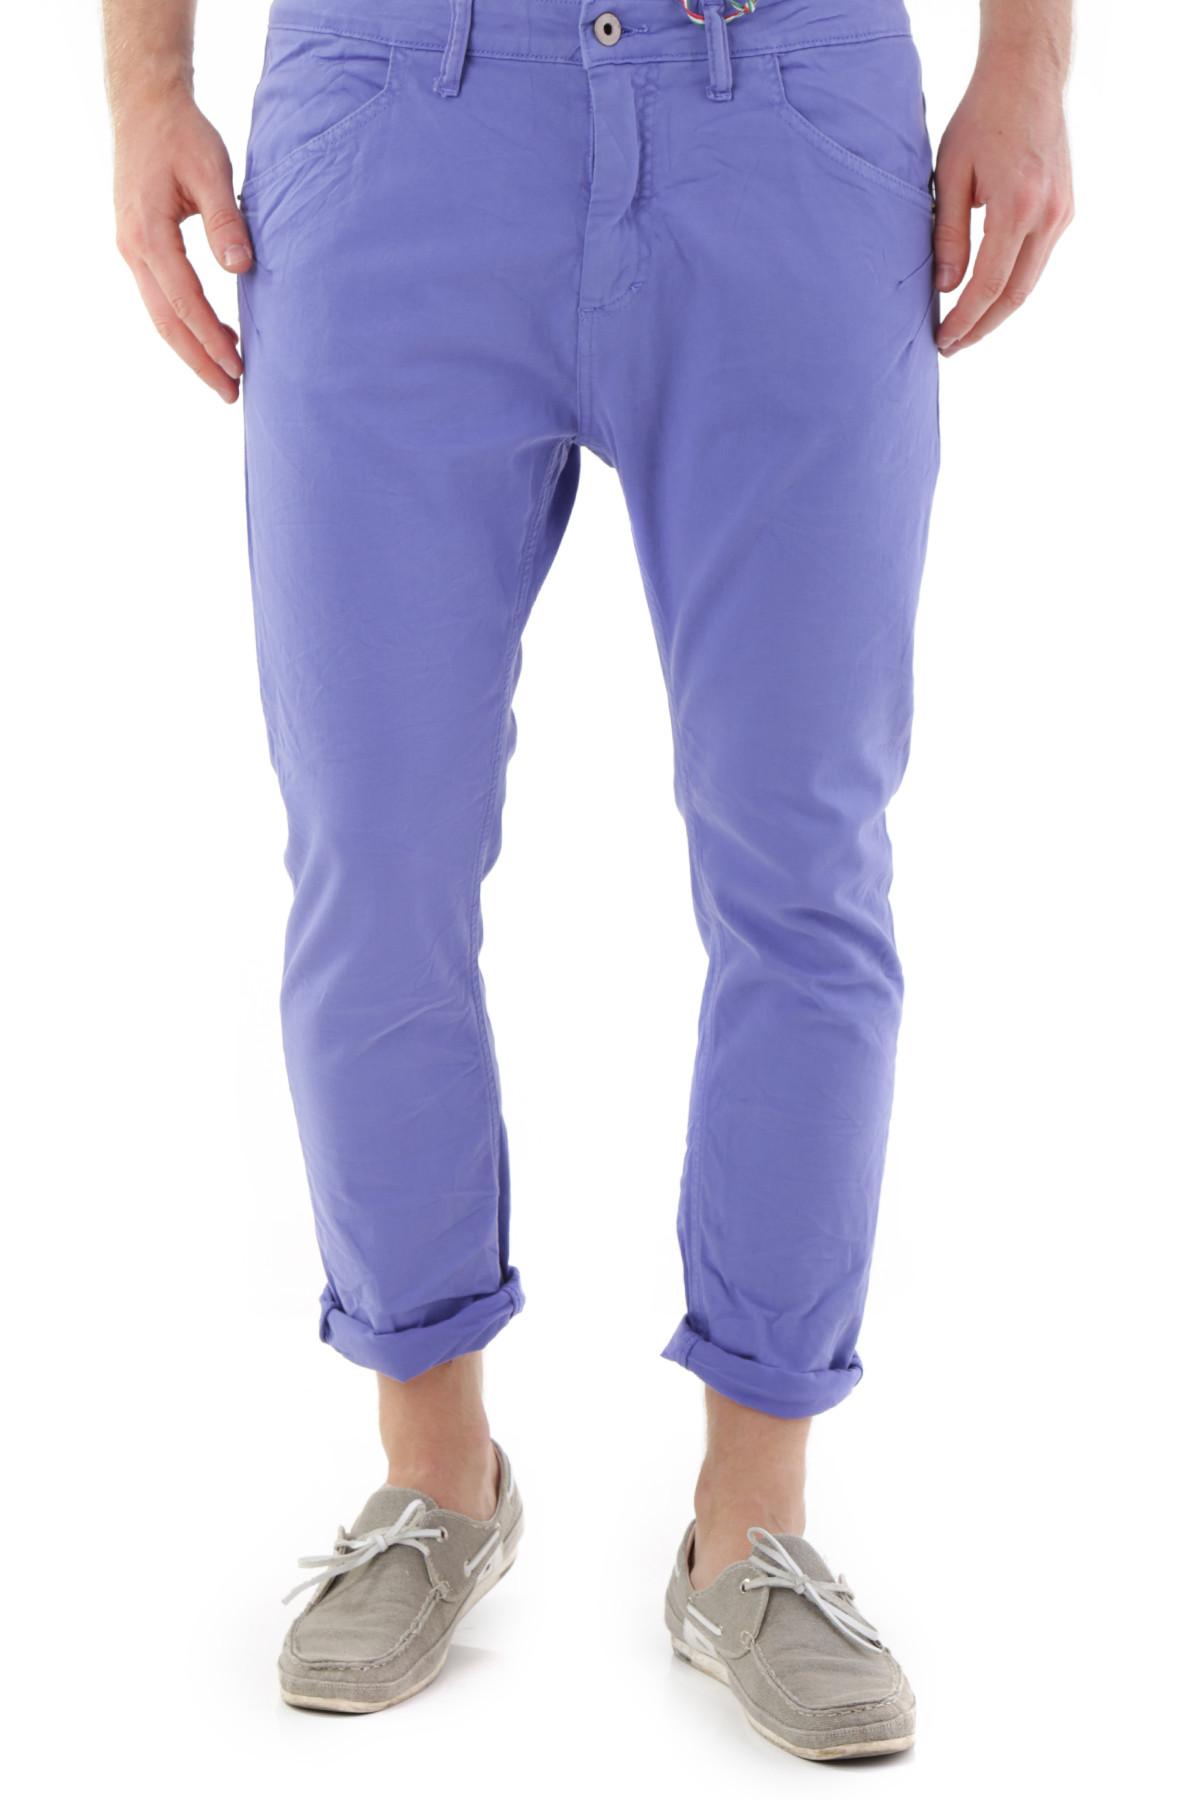 525 Pantaloni Muži